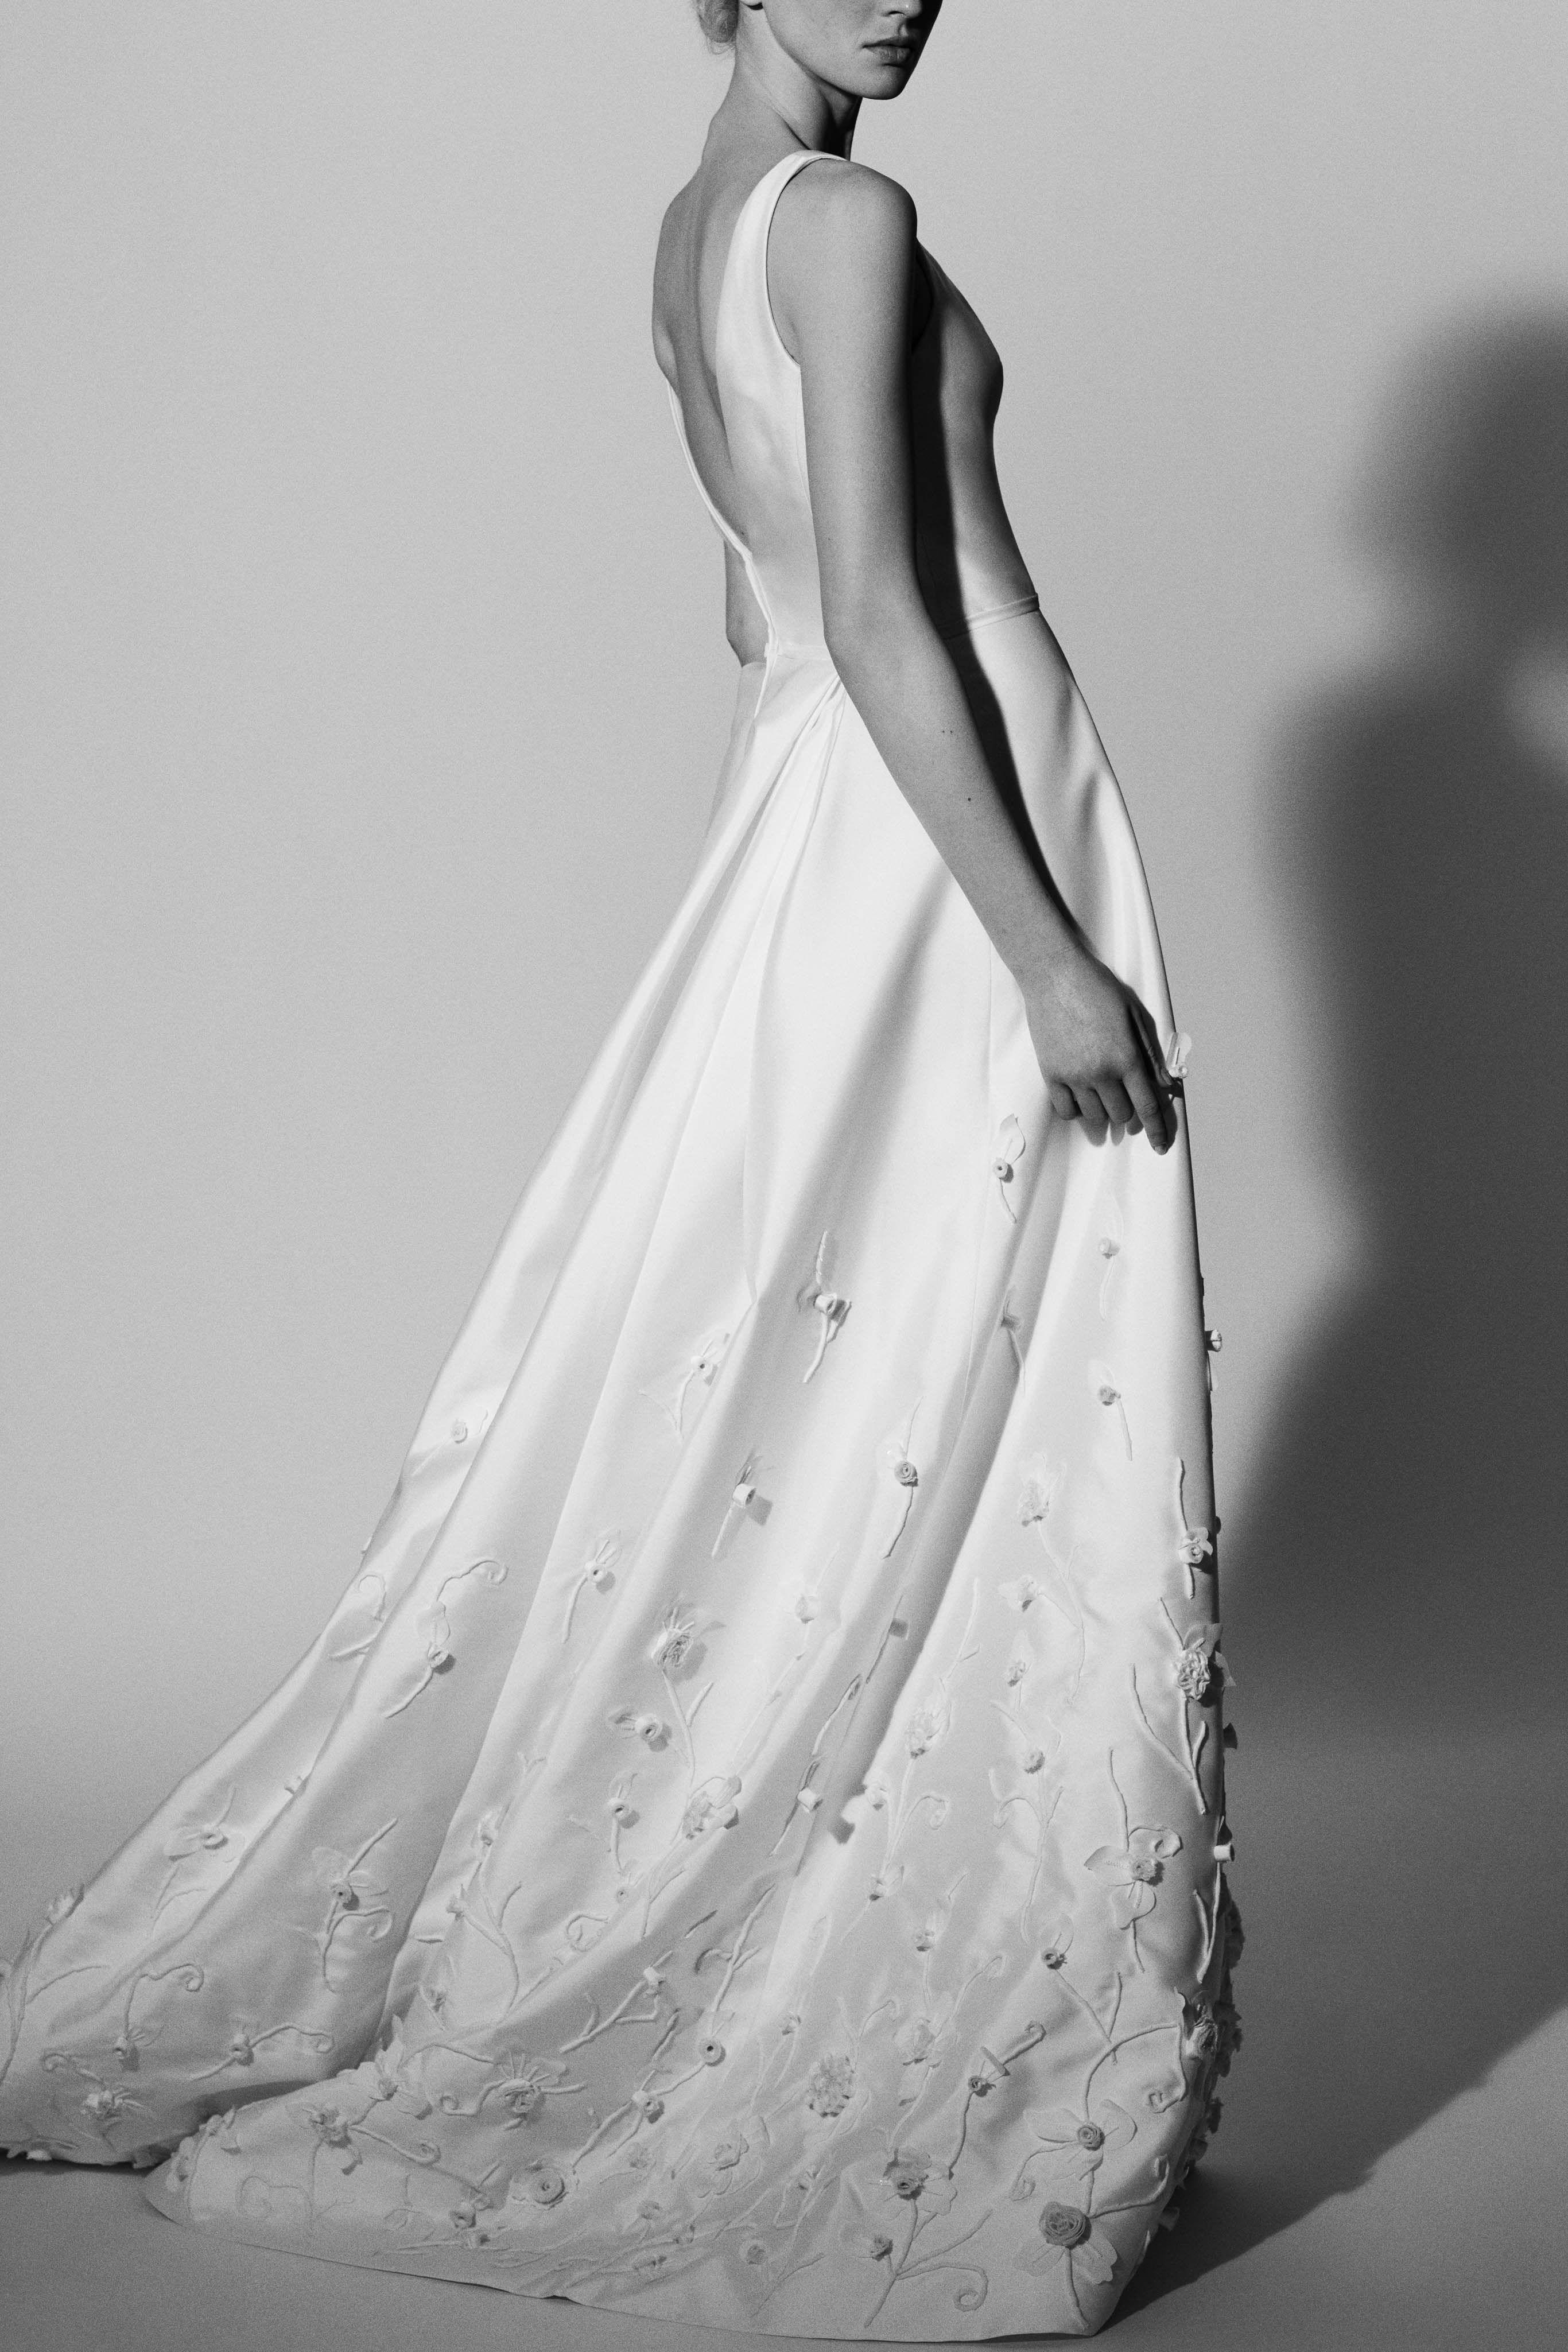 cf818f75681c2 Carolina Herrera Bridal Spring 2018 - See Every Look From Carolina Herrera's  Spring 2018 Bridal Collection